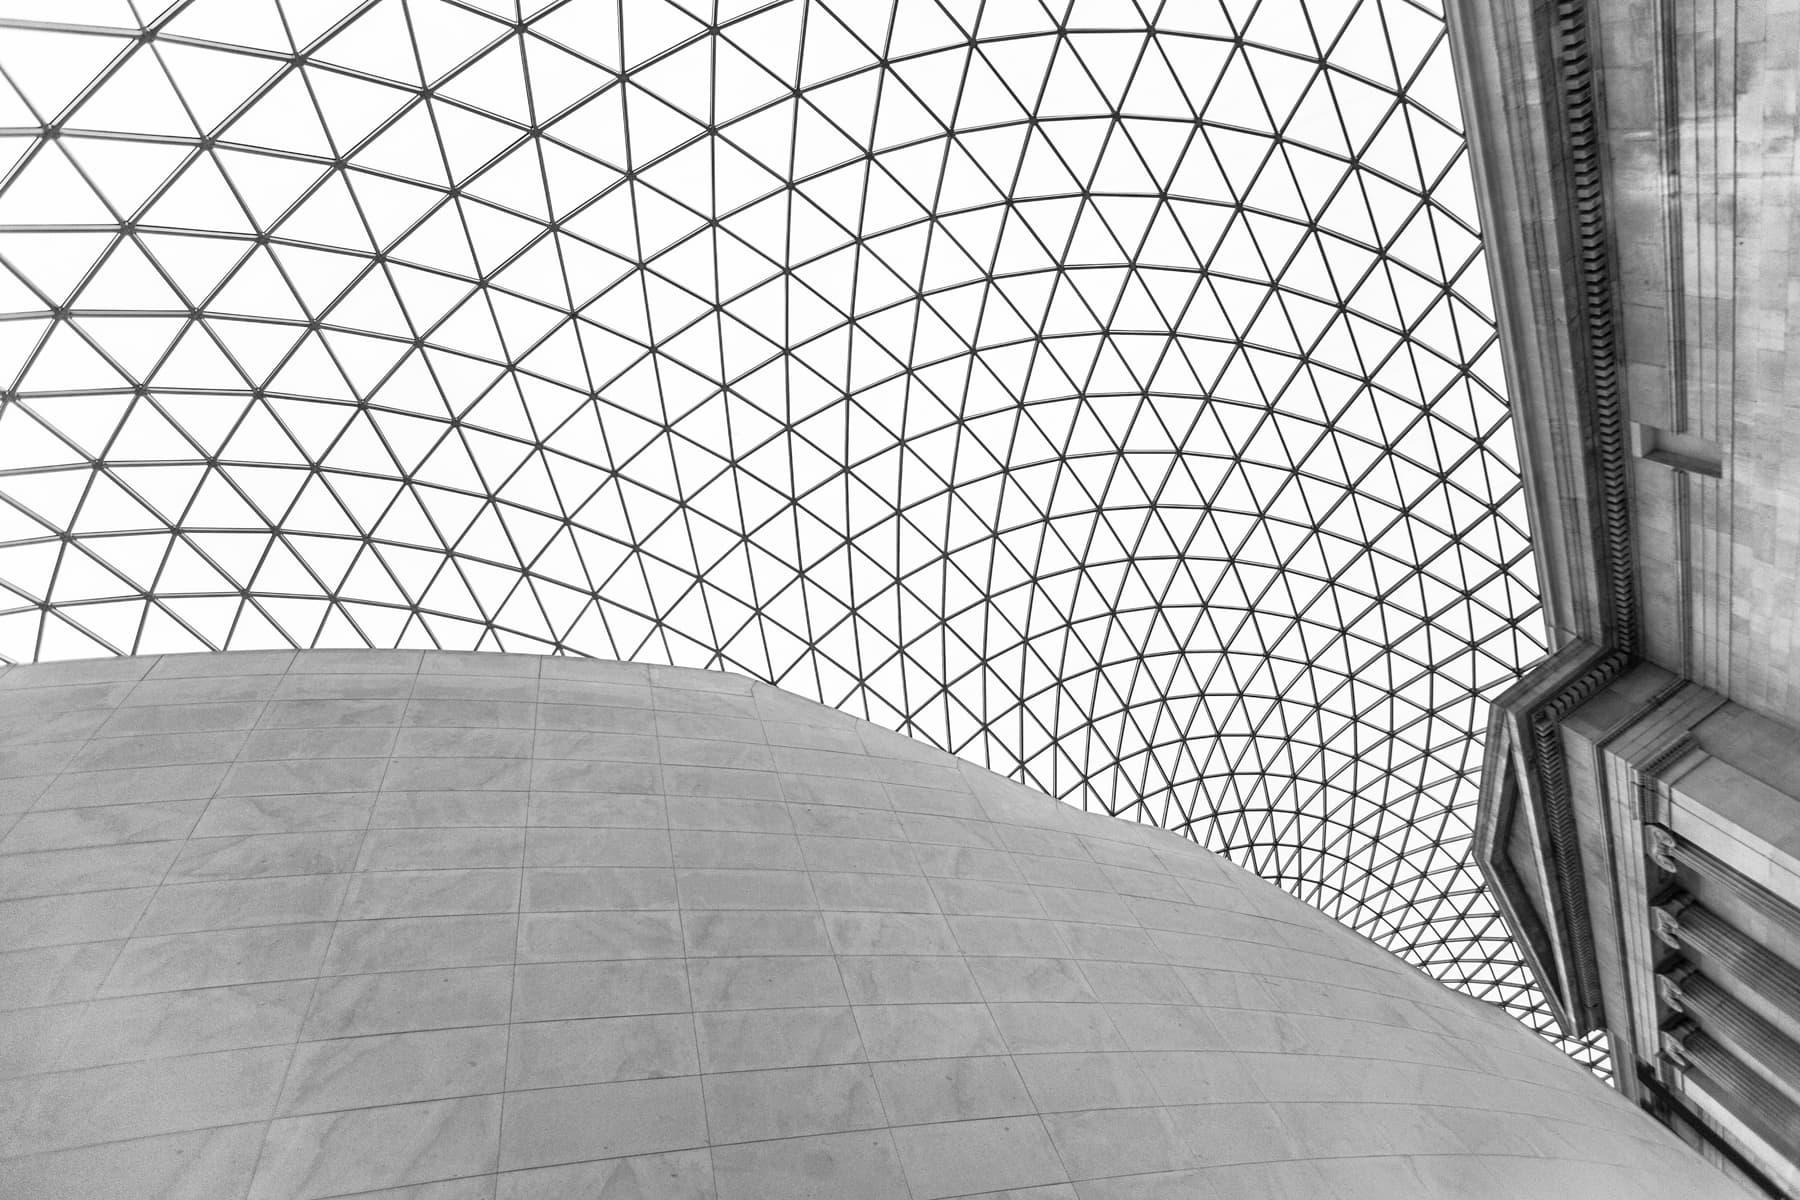 fabio_burrelli_street_photography_architecture_urban_structures_london_P5B2993.jpg